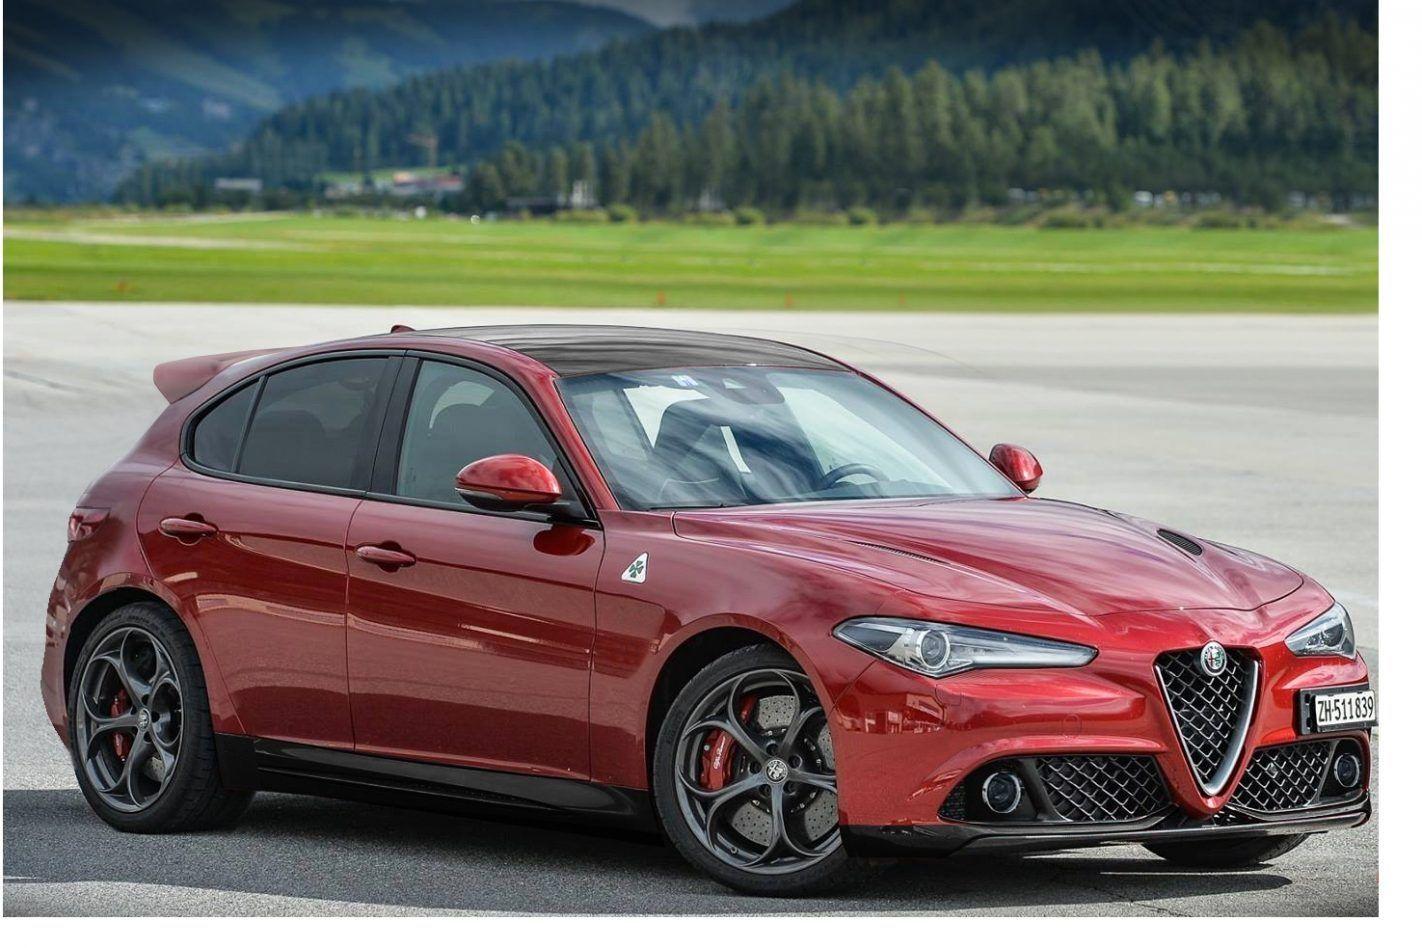 New Alfa Romeo Giulietta 2019 Price Cars Review 2019 Alfa Romeo Giulietta Alfa Romeo Alfa Cars